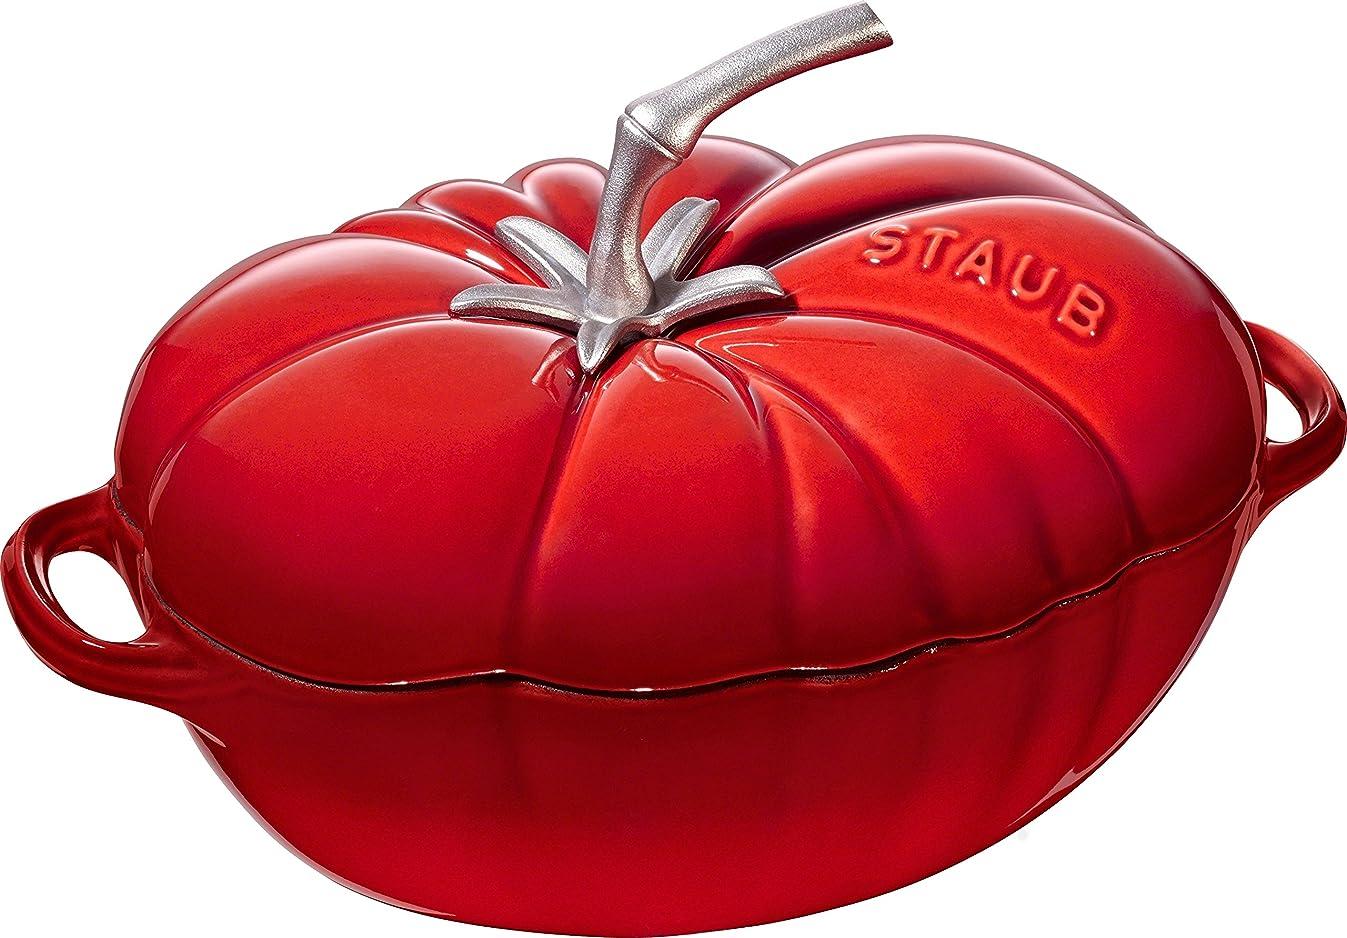 Staub 3-quart Cast Iron Tomato Cocotte